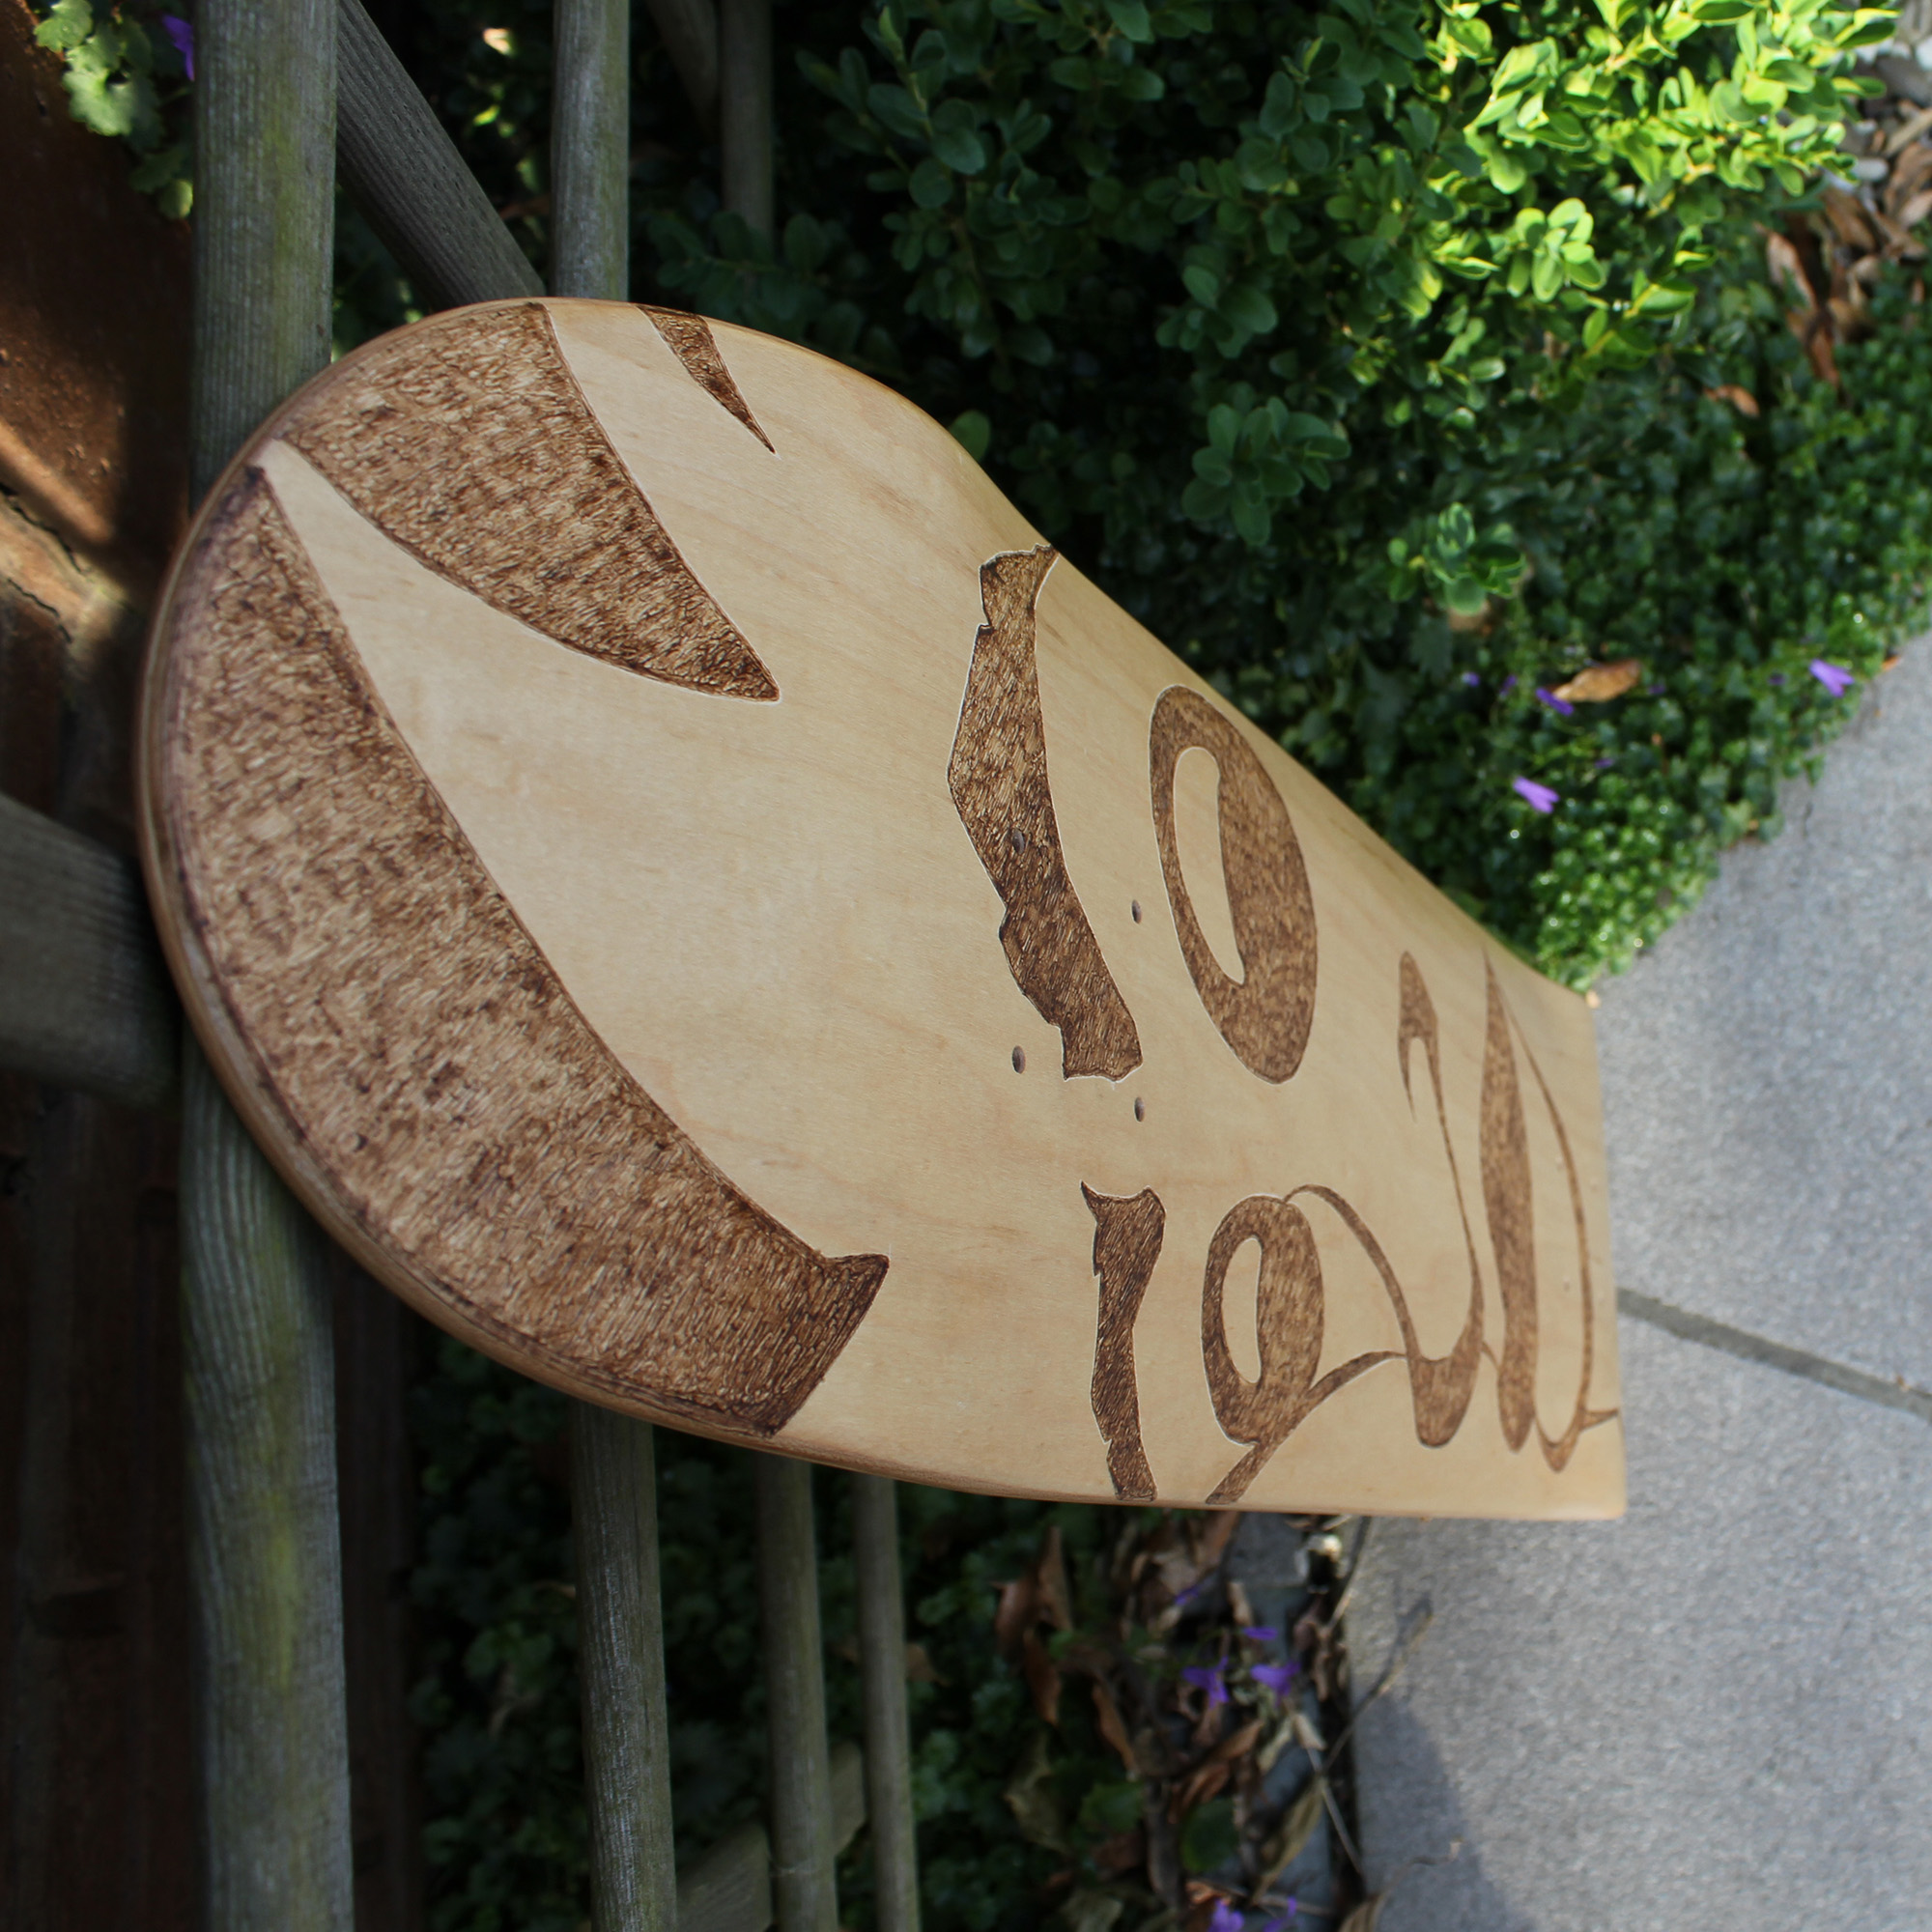 WatoSKATE #1 – Original Skateboard Deck